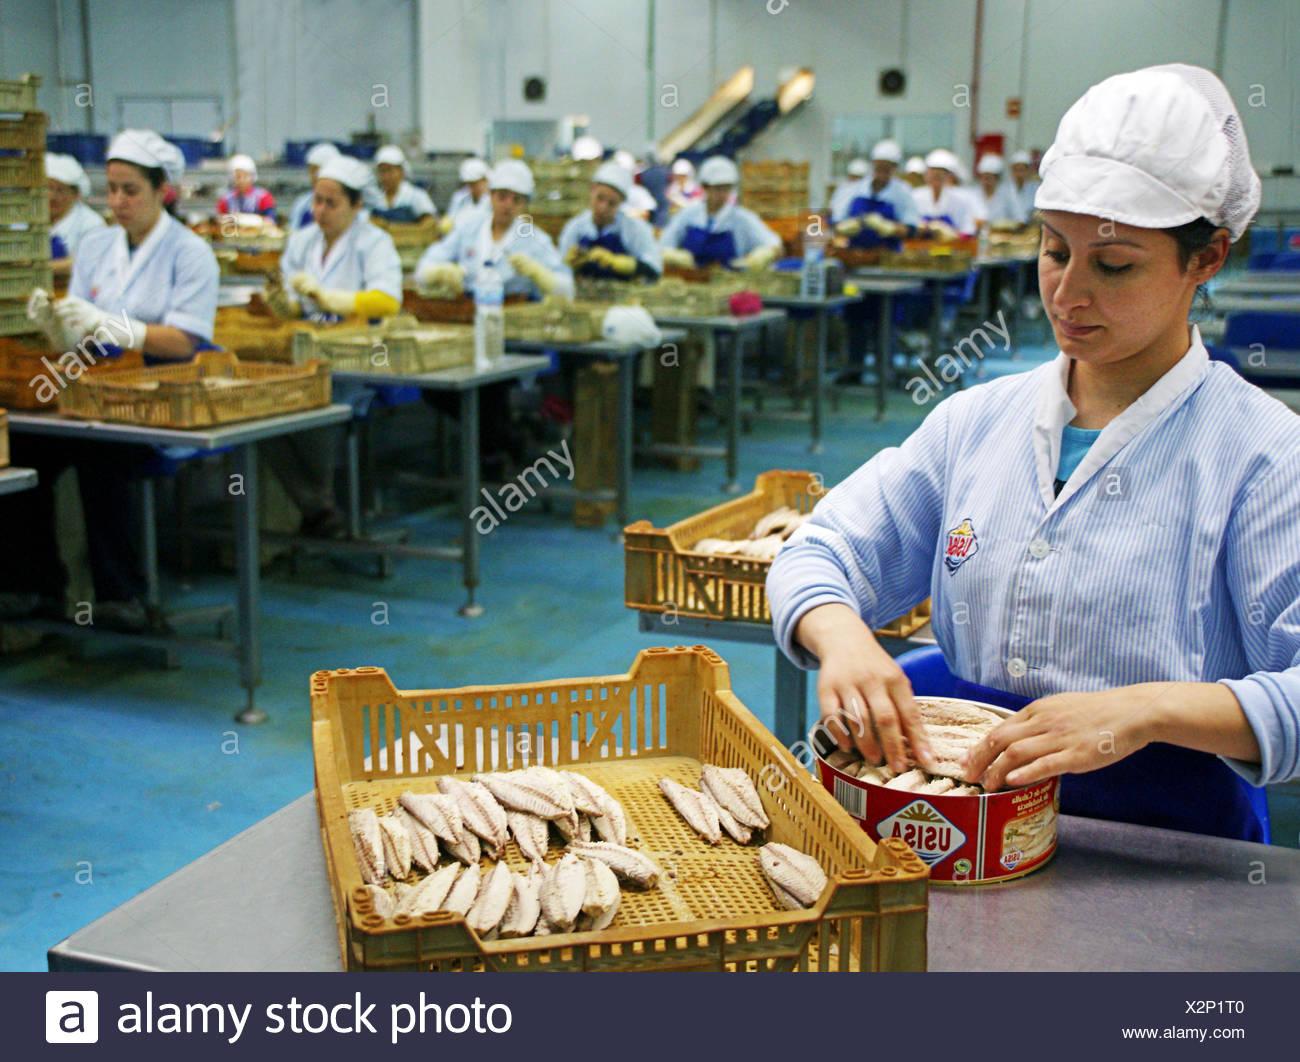 Mackerel during canning process, USISA trademark, Isla Cristina, Huelva province, Andalusia, Spain - Stock Image